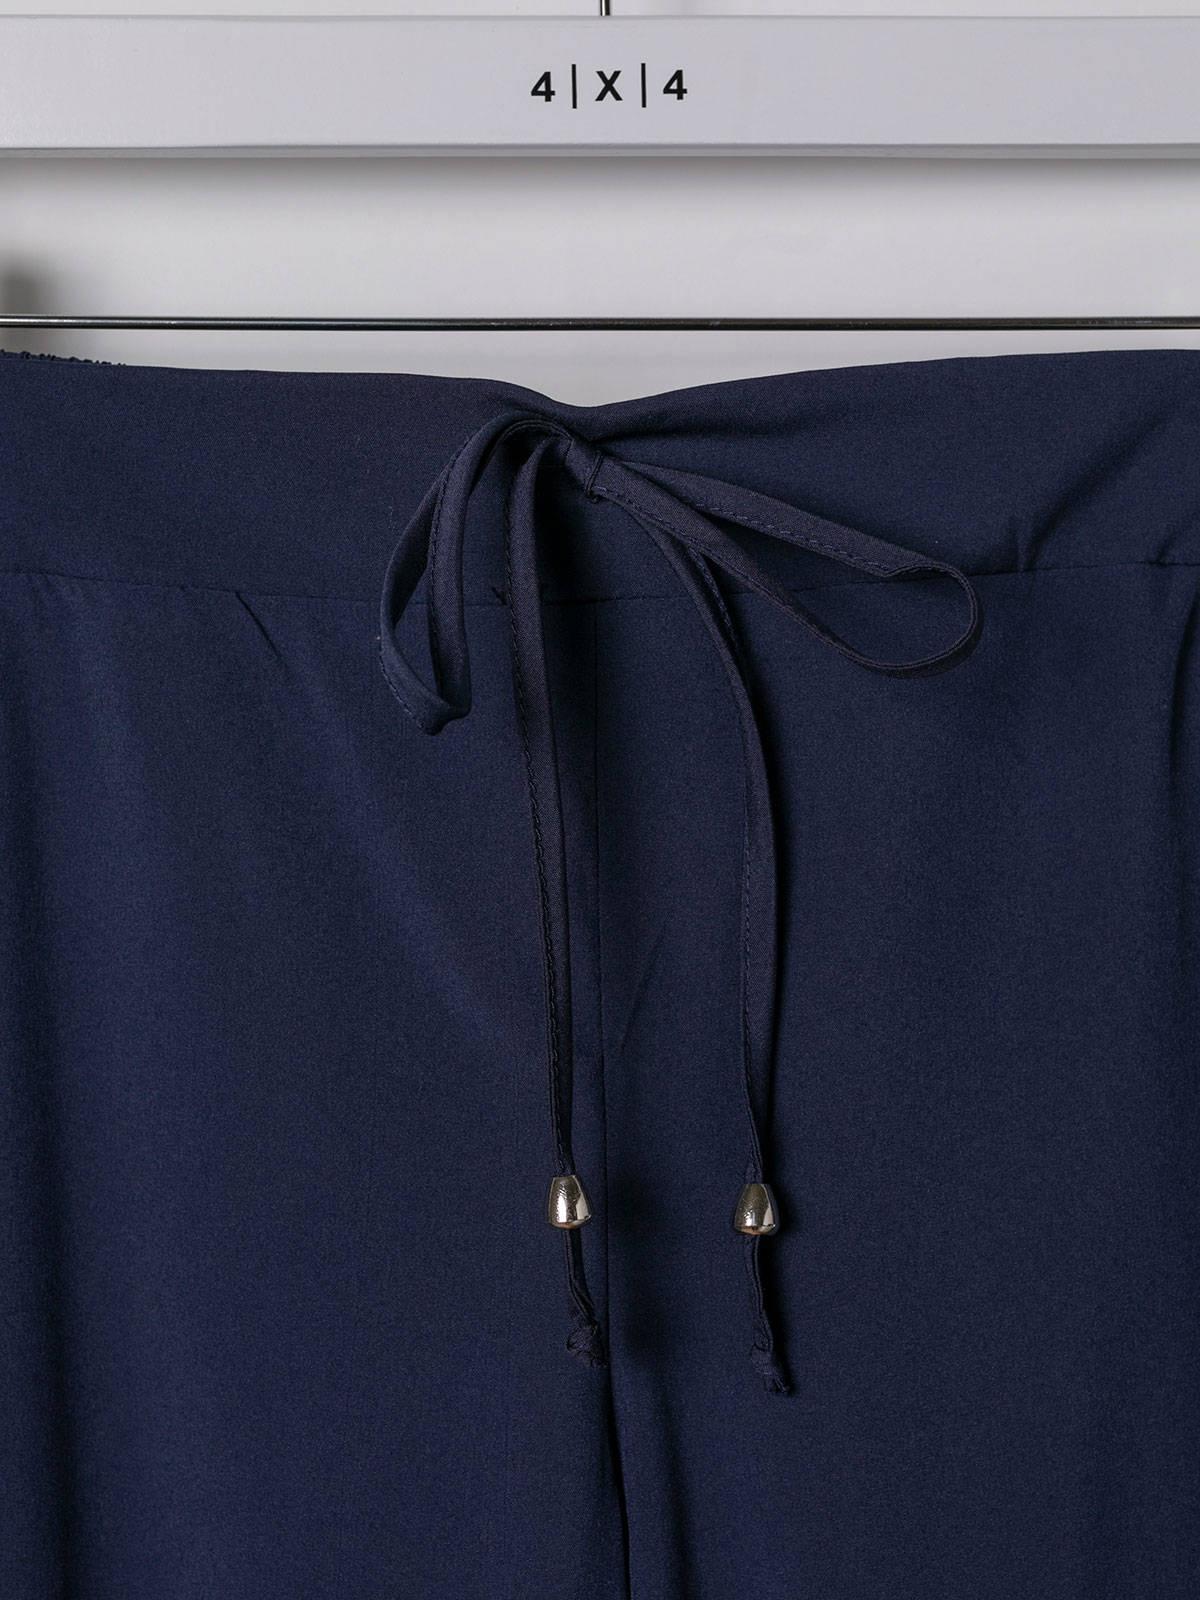 Pantalón mujer confort liso Azul Marino